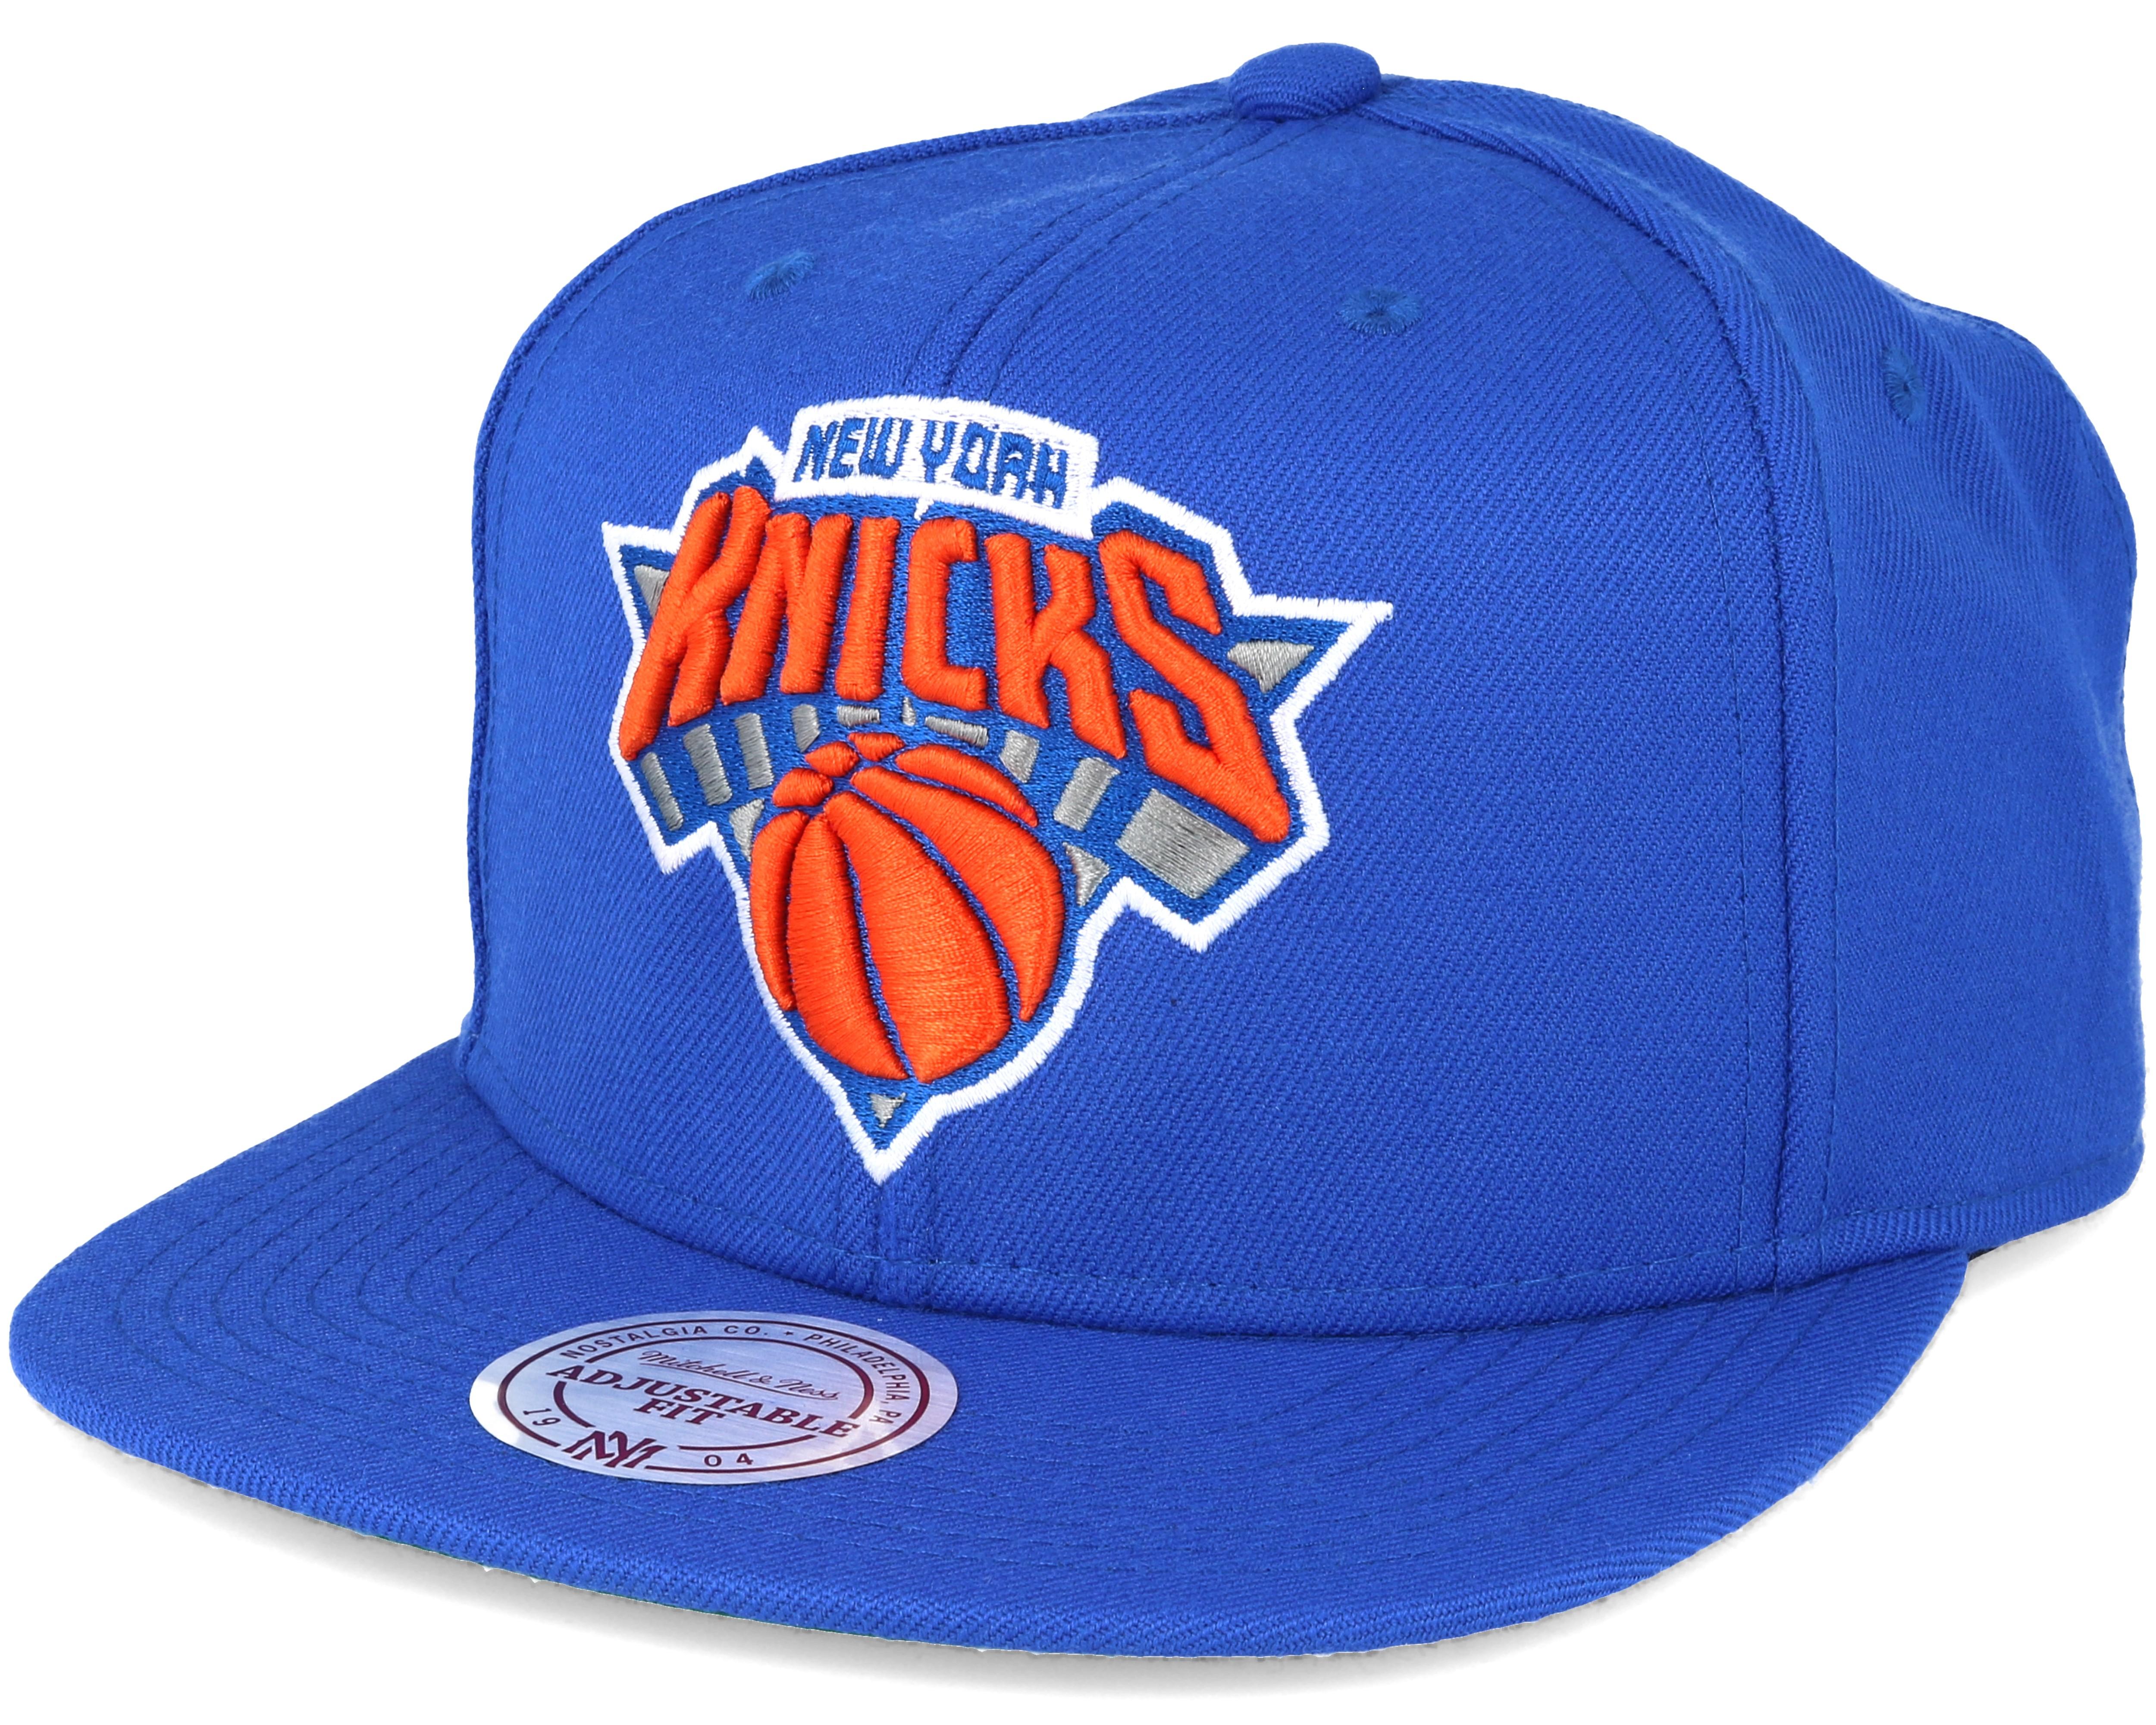 2244b87d88f3a New York Knicks Wool Solid Solid 2 Blue Snapback - Mitchell   Ness ...